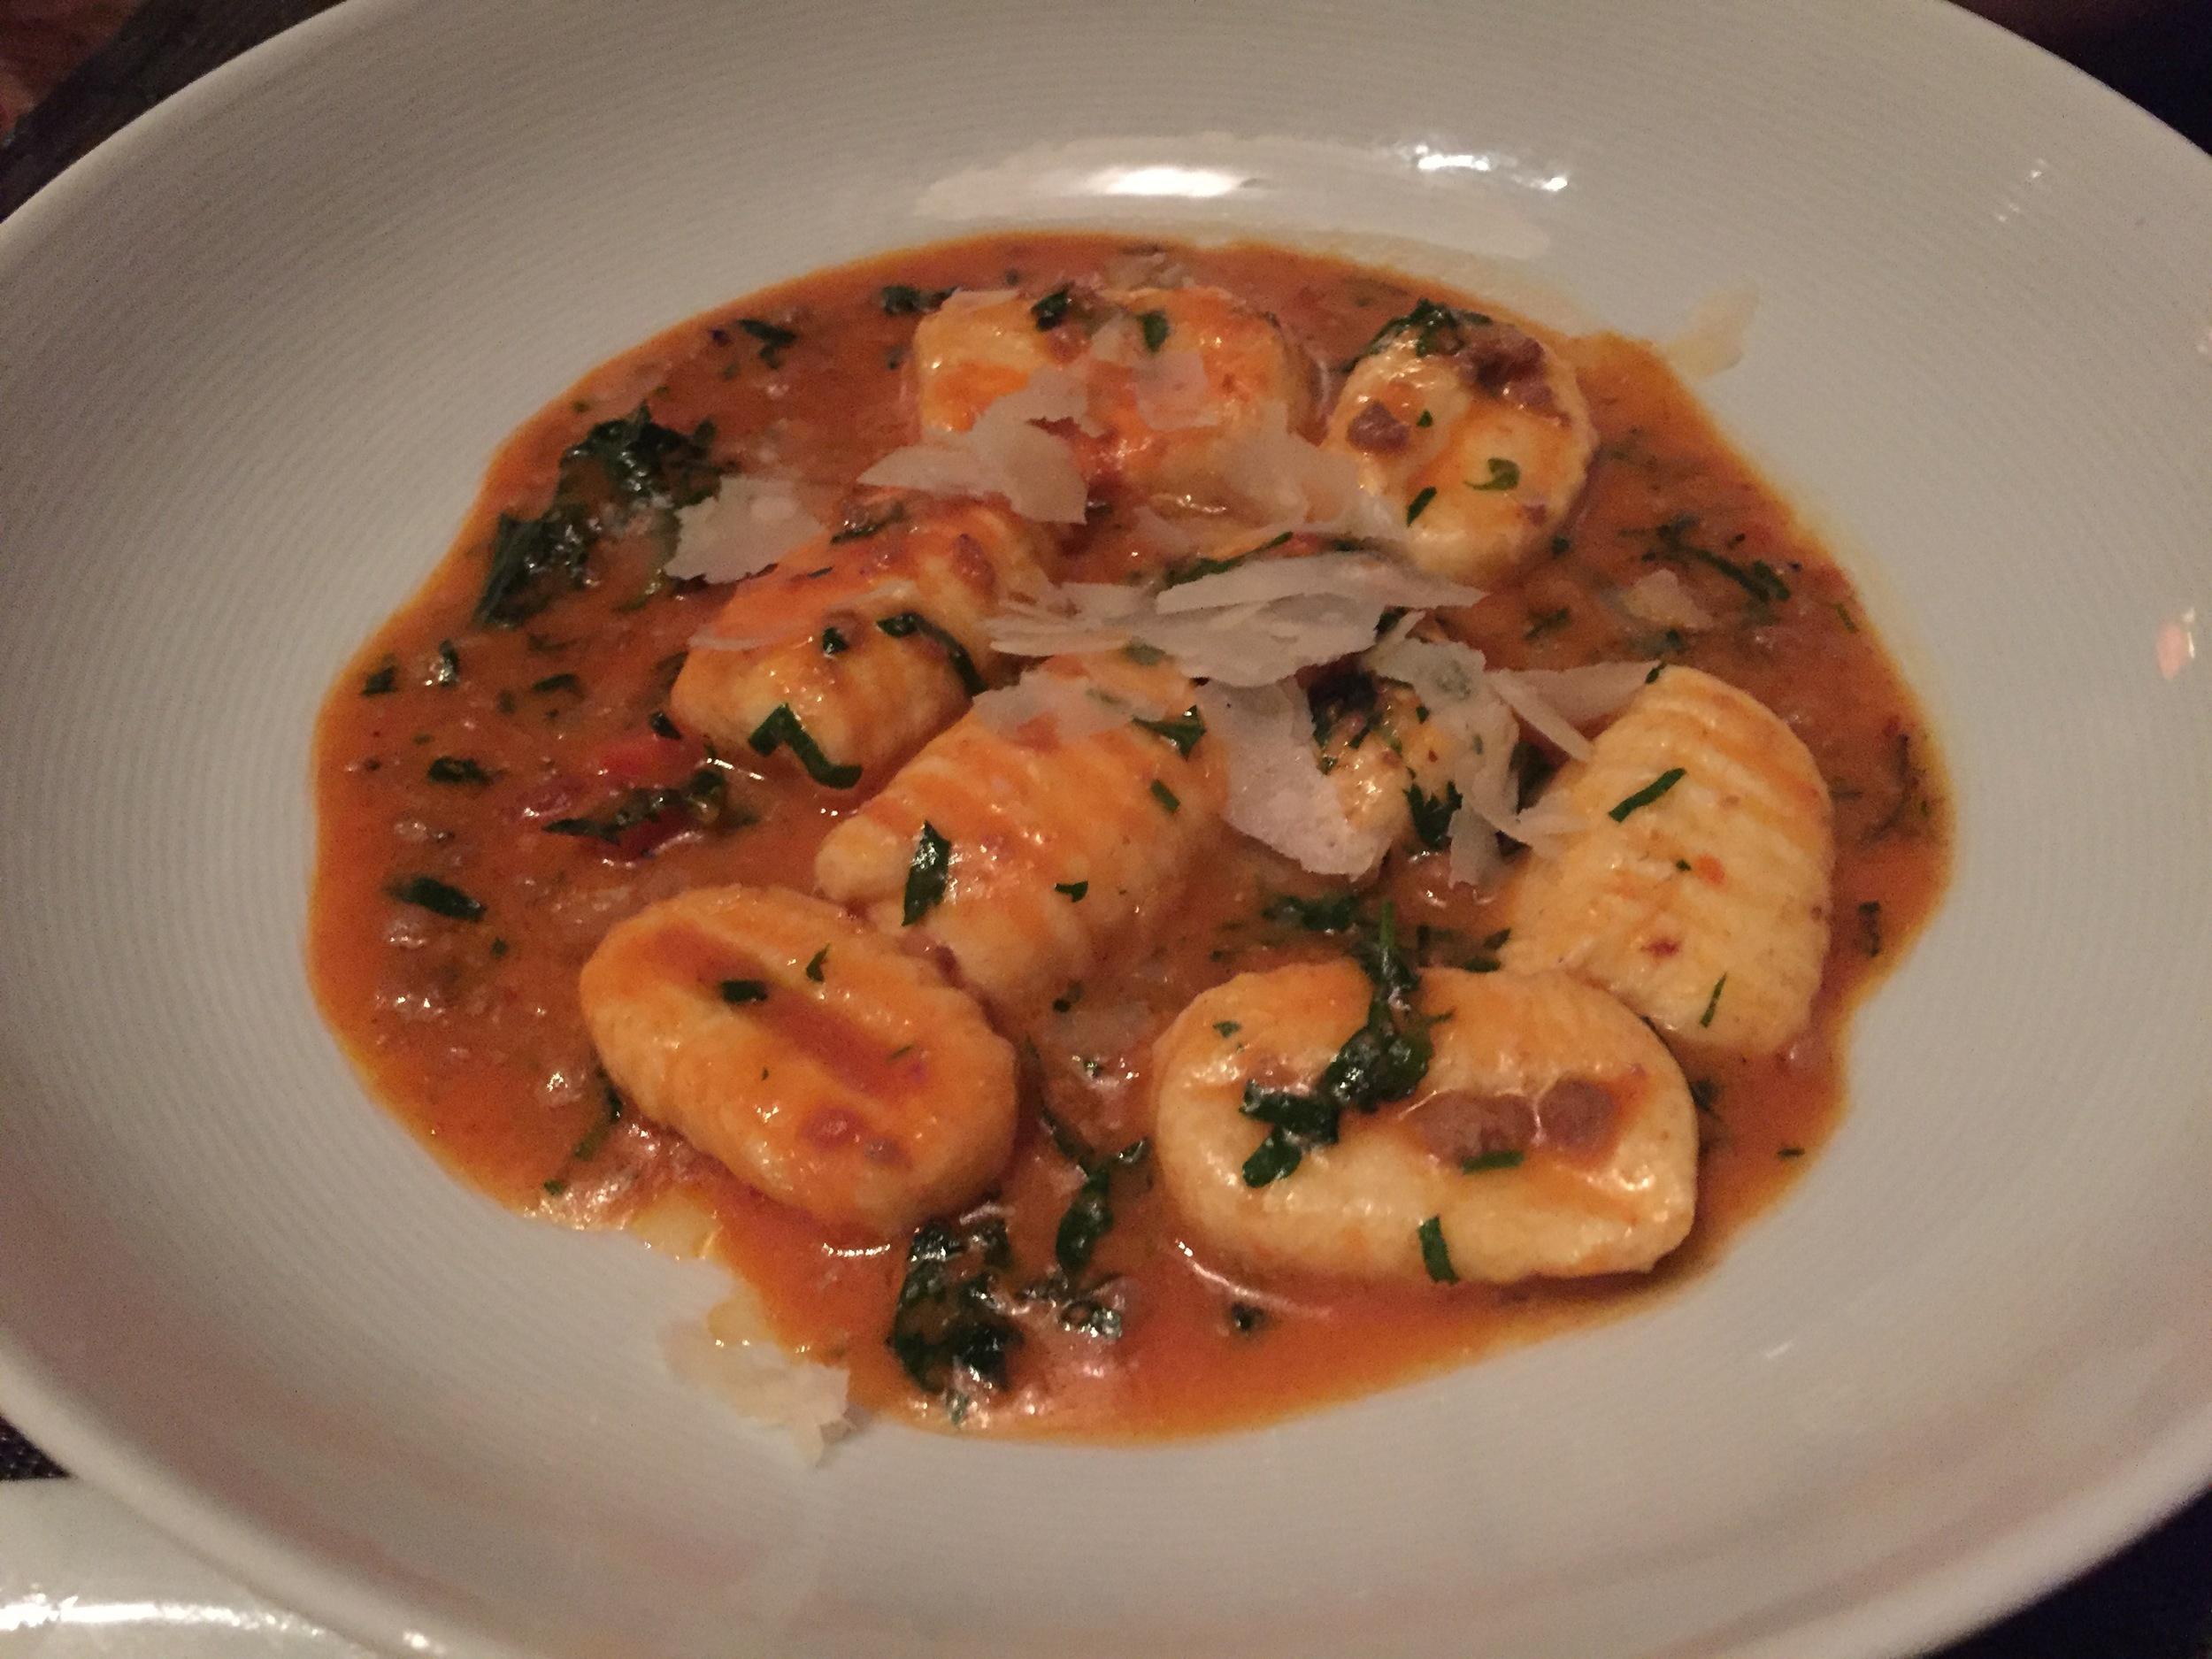 Ricotta Gnocchi with Pork Bolognese